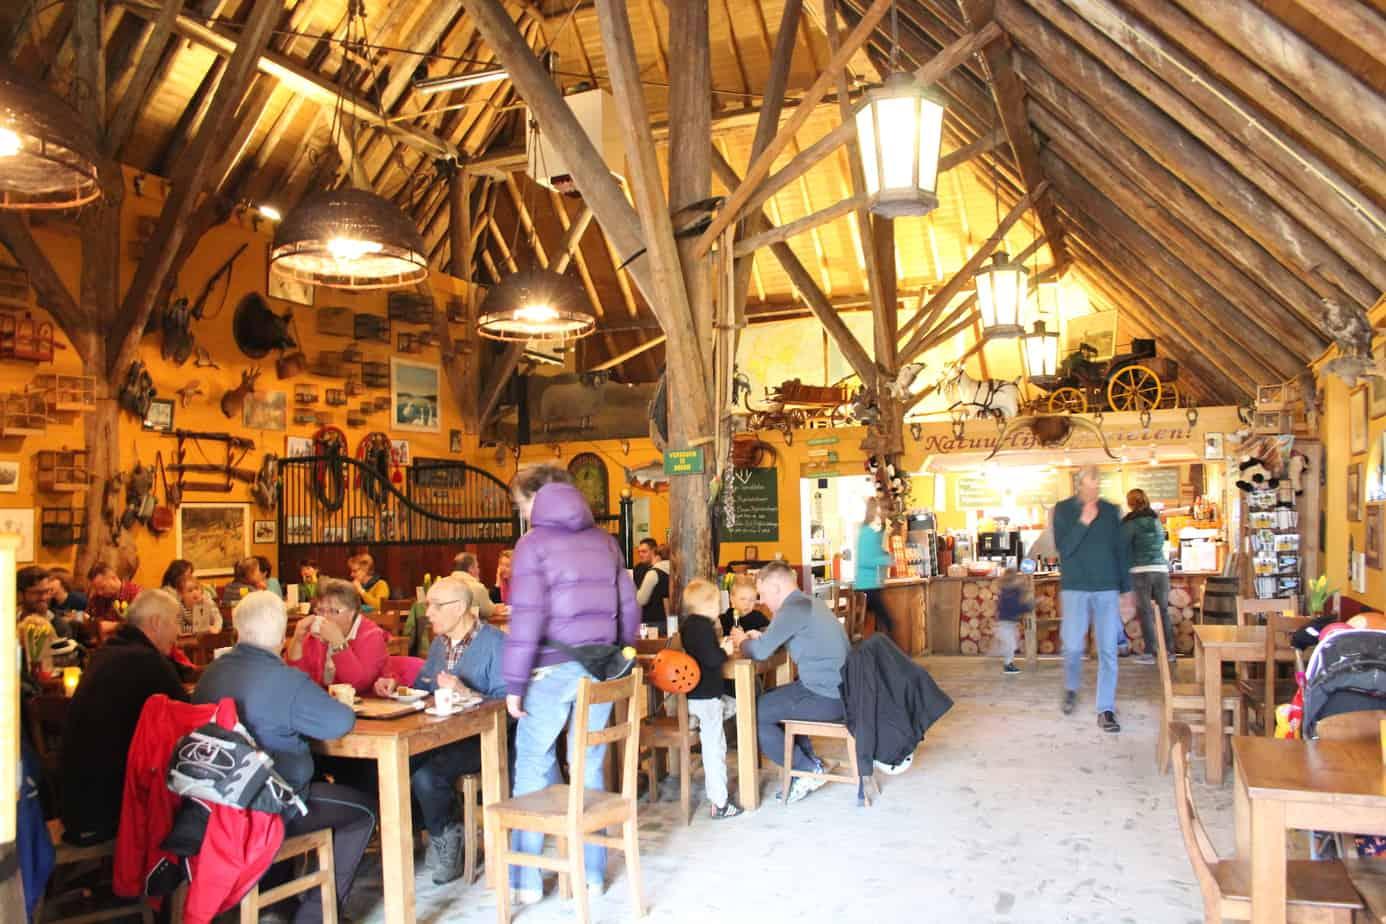 Gasterij Kruisberg, Heemskerk | ENJOY! The Good Life